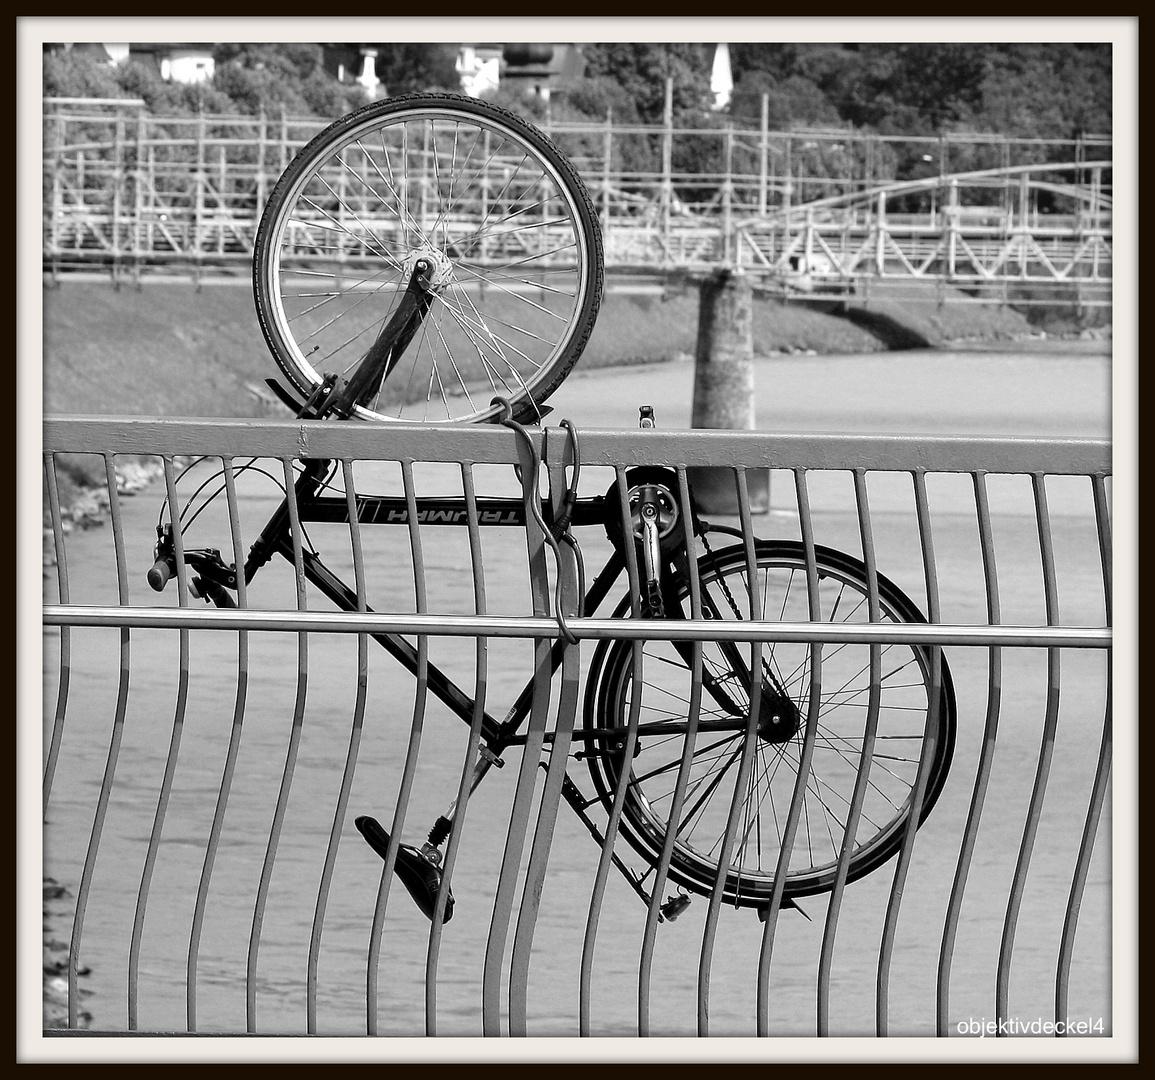 Fahrrad abstellen, mal anders